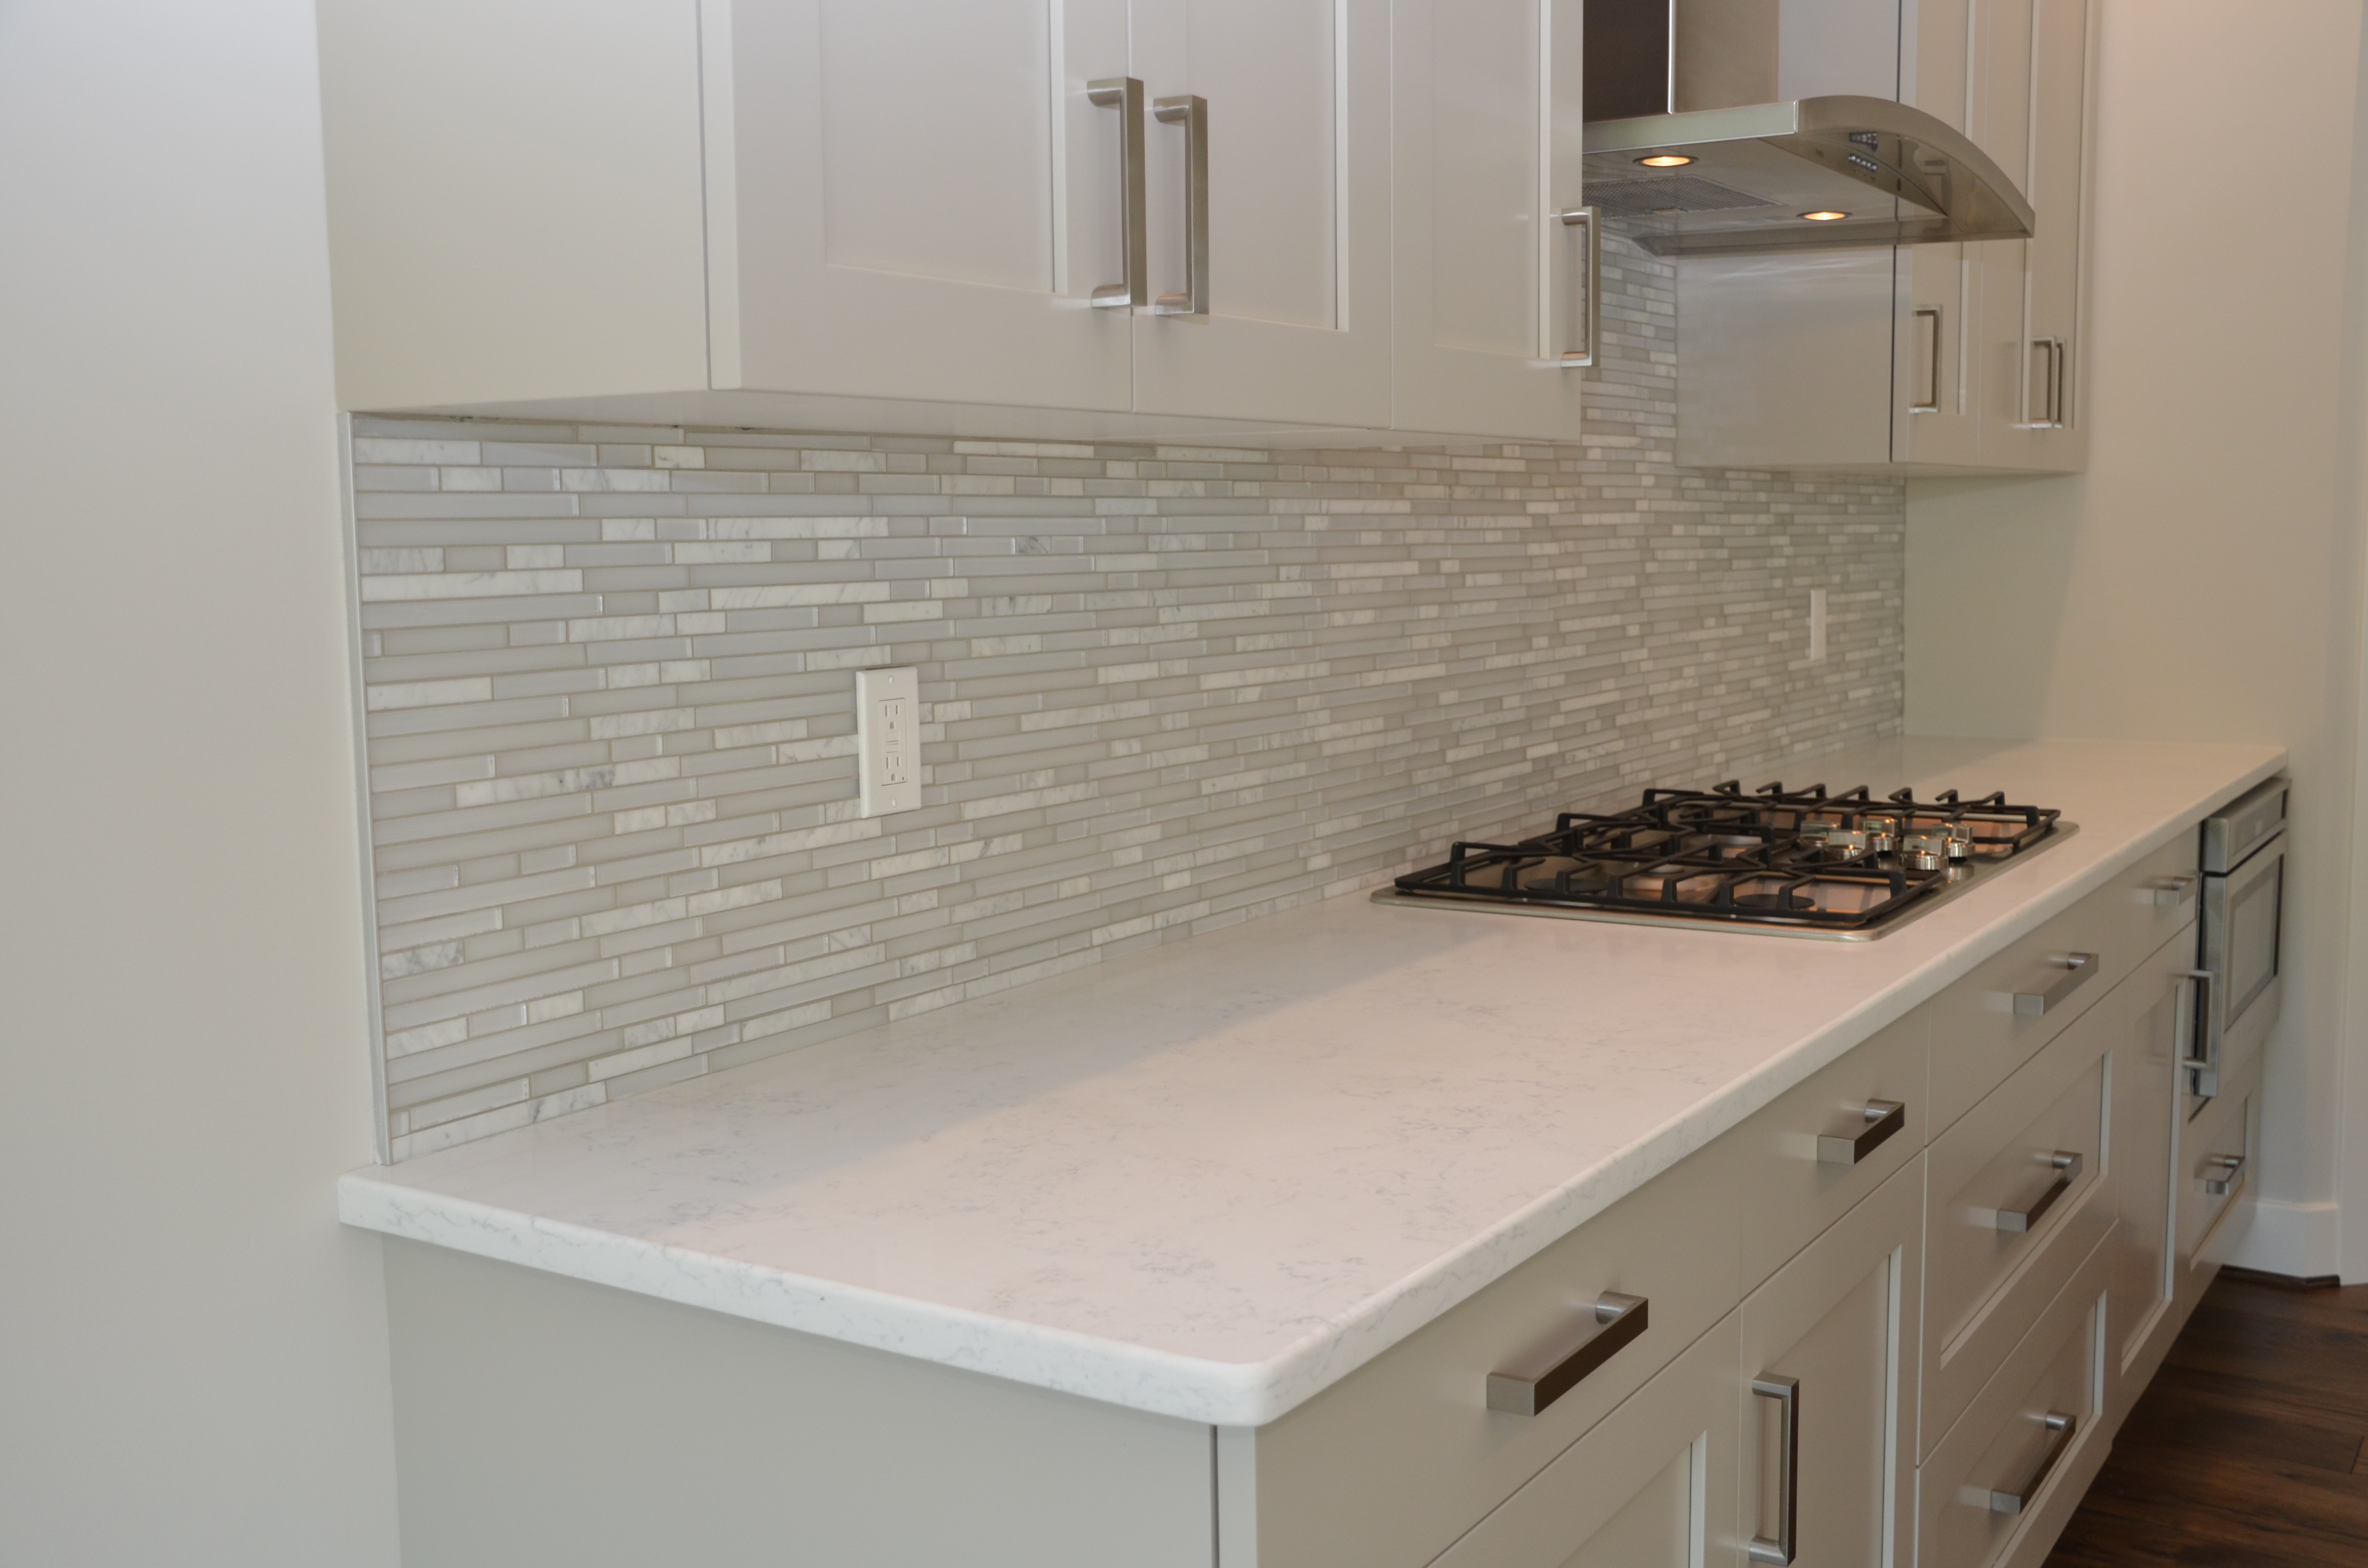 #14 Ravenna Crescent (Lot 28) Tiled Kitchen Space